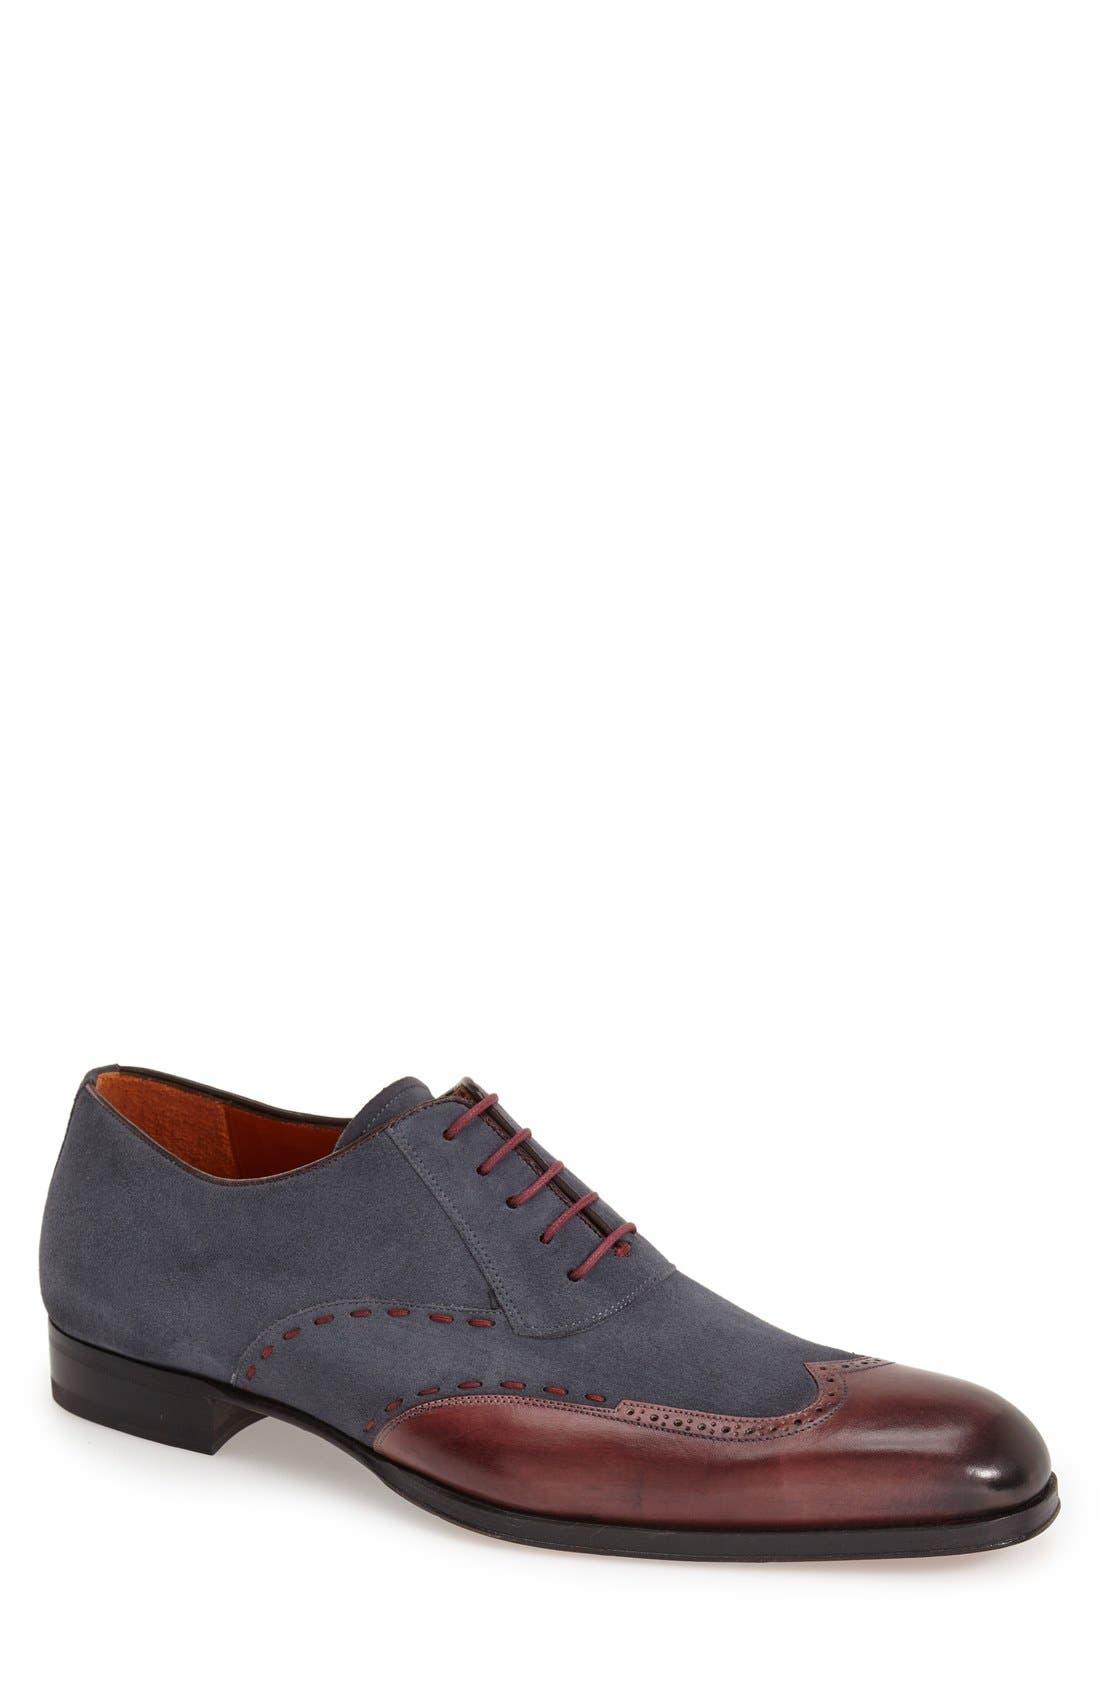 'Ronda' Spectator Shoe,                         Main,                         color, Burgundy/ Grey